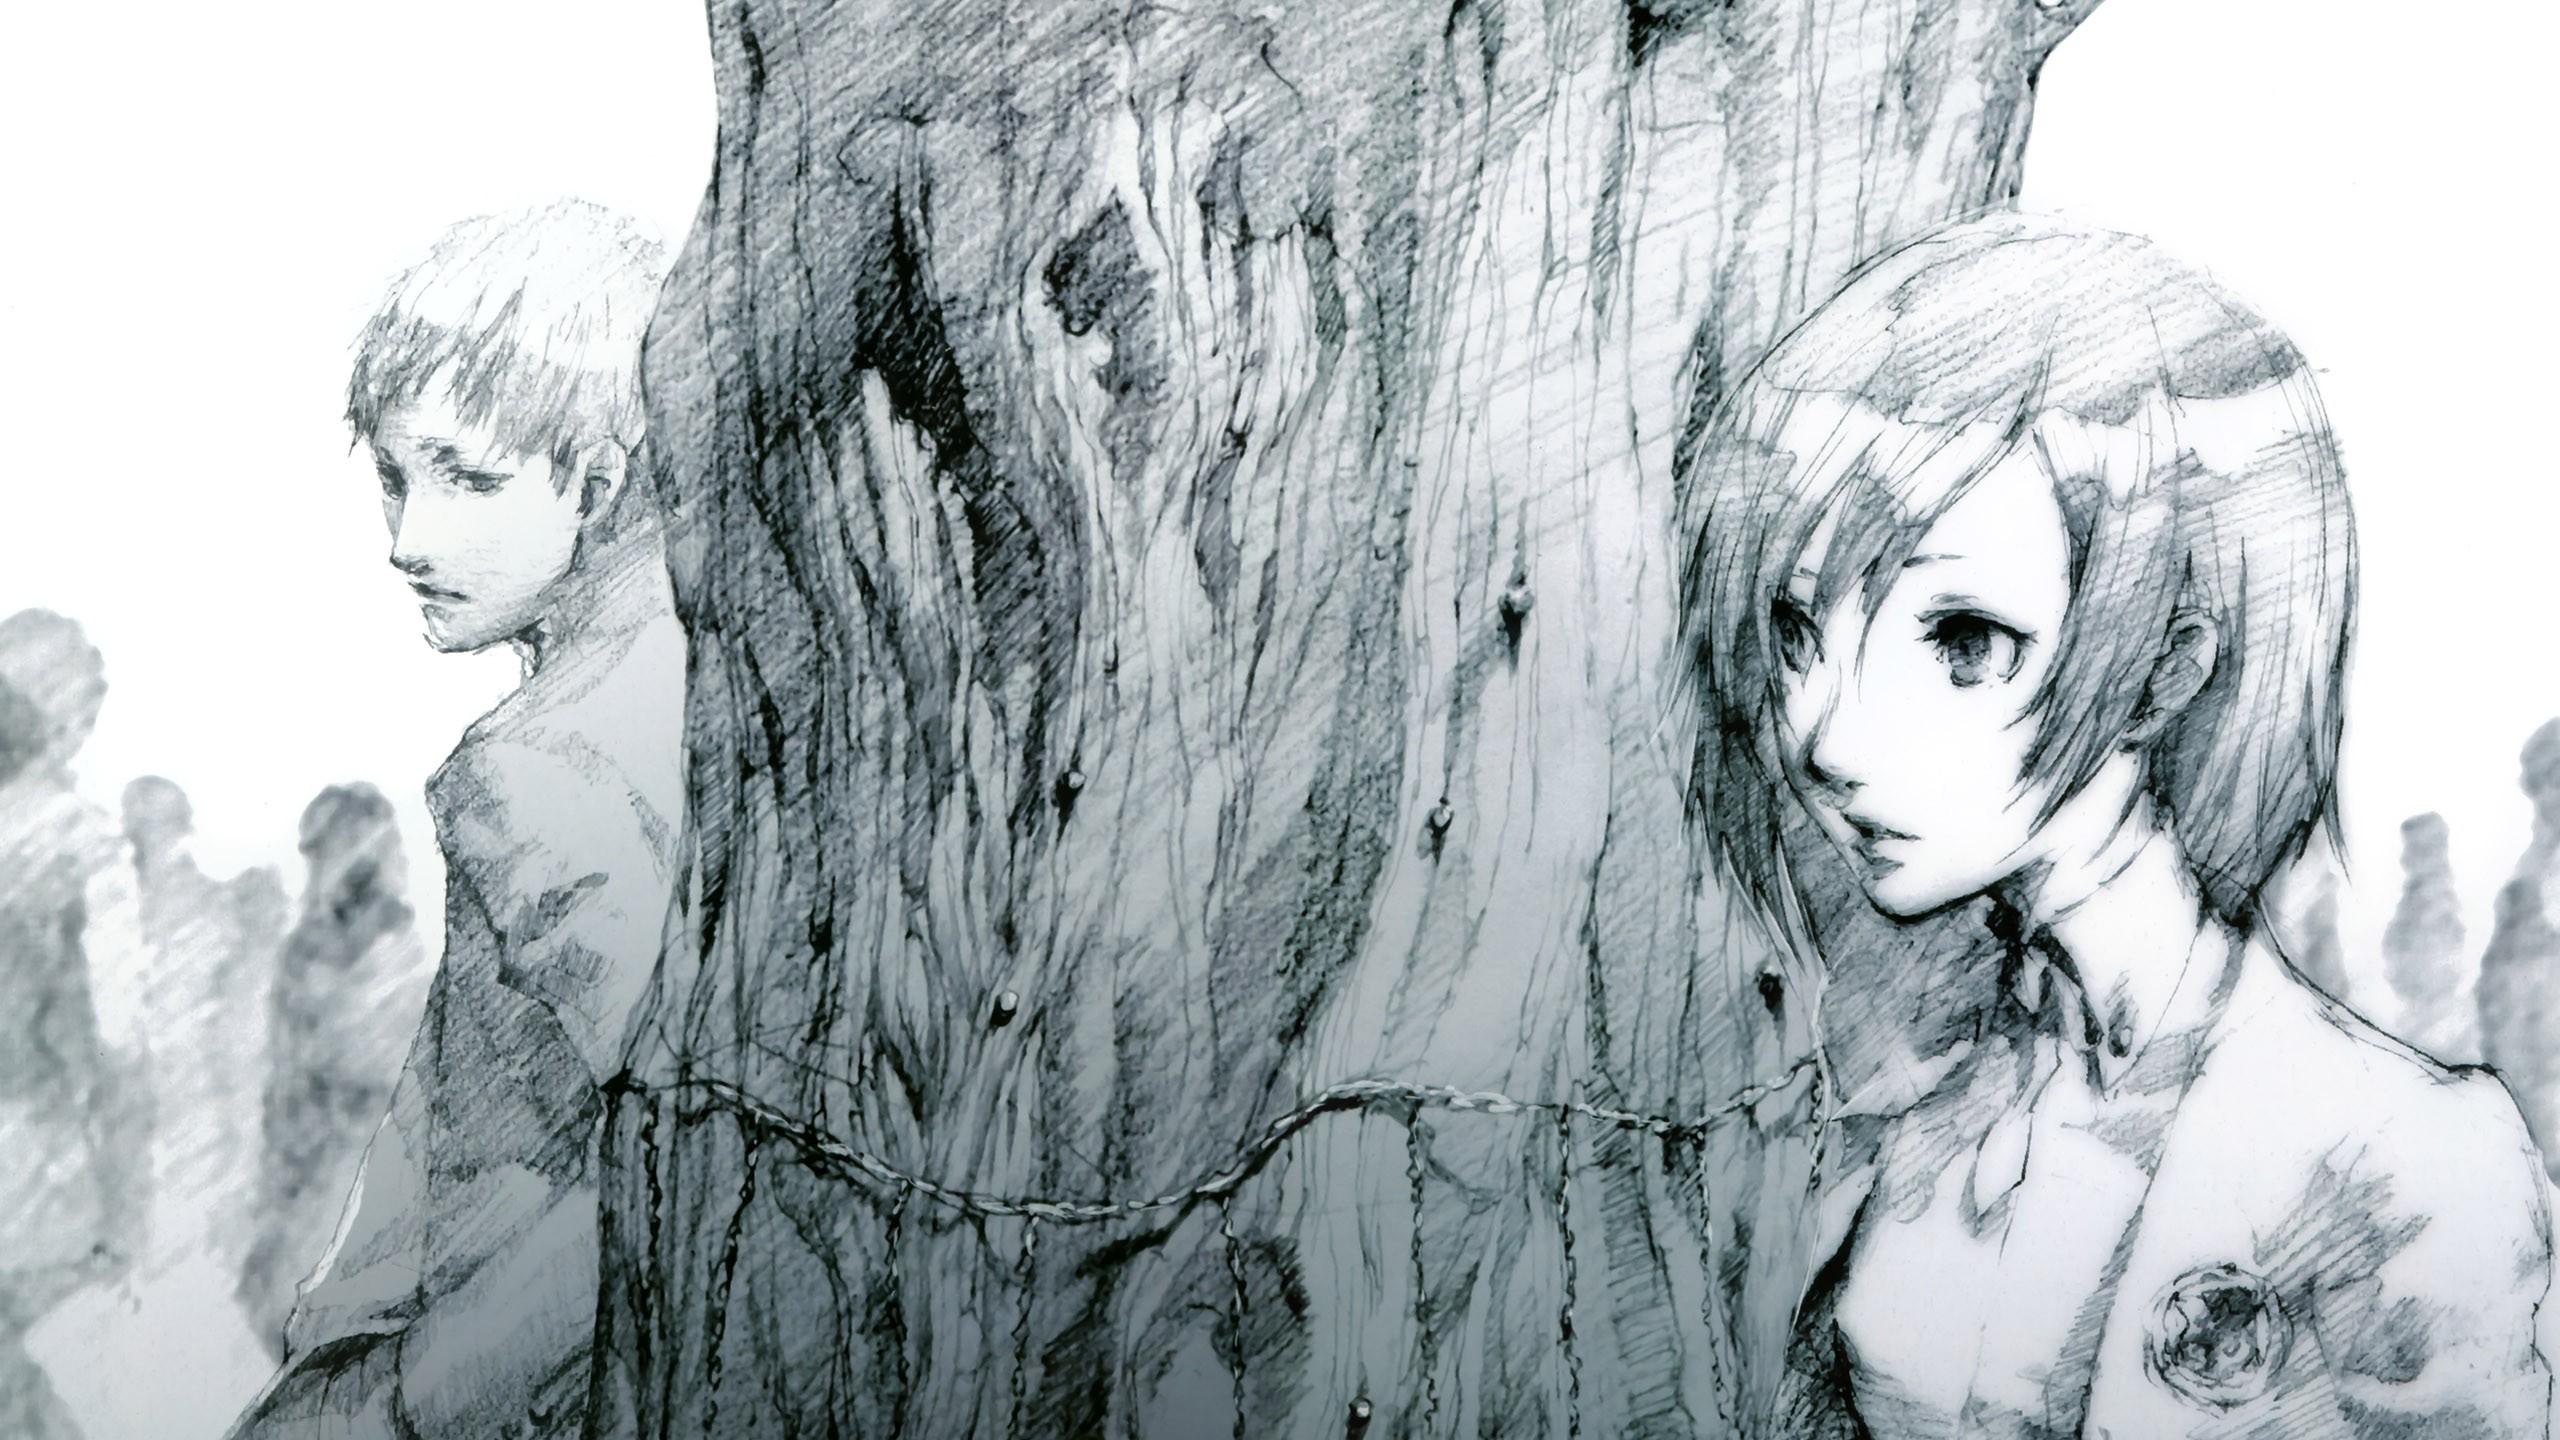 Cute Japanese Art 4k Wallpaper Sketches Wallpapers 183 ①